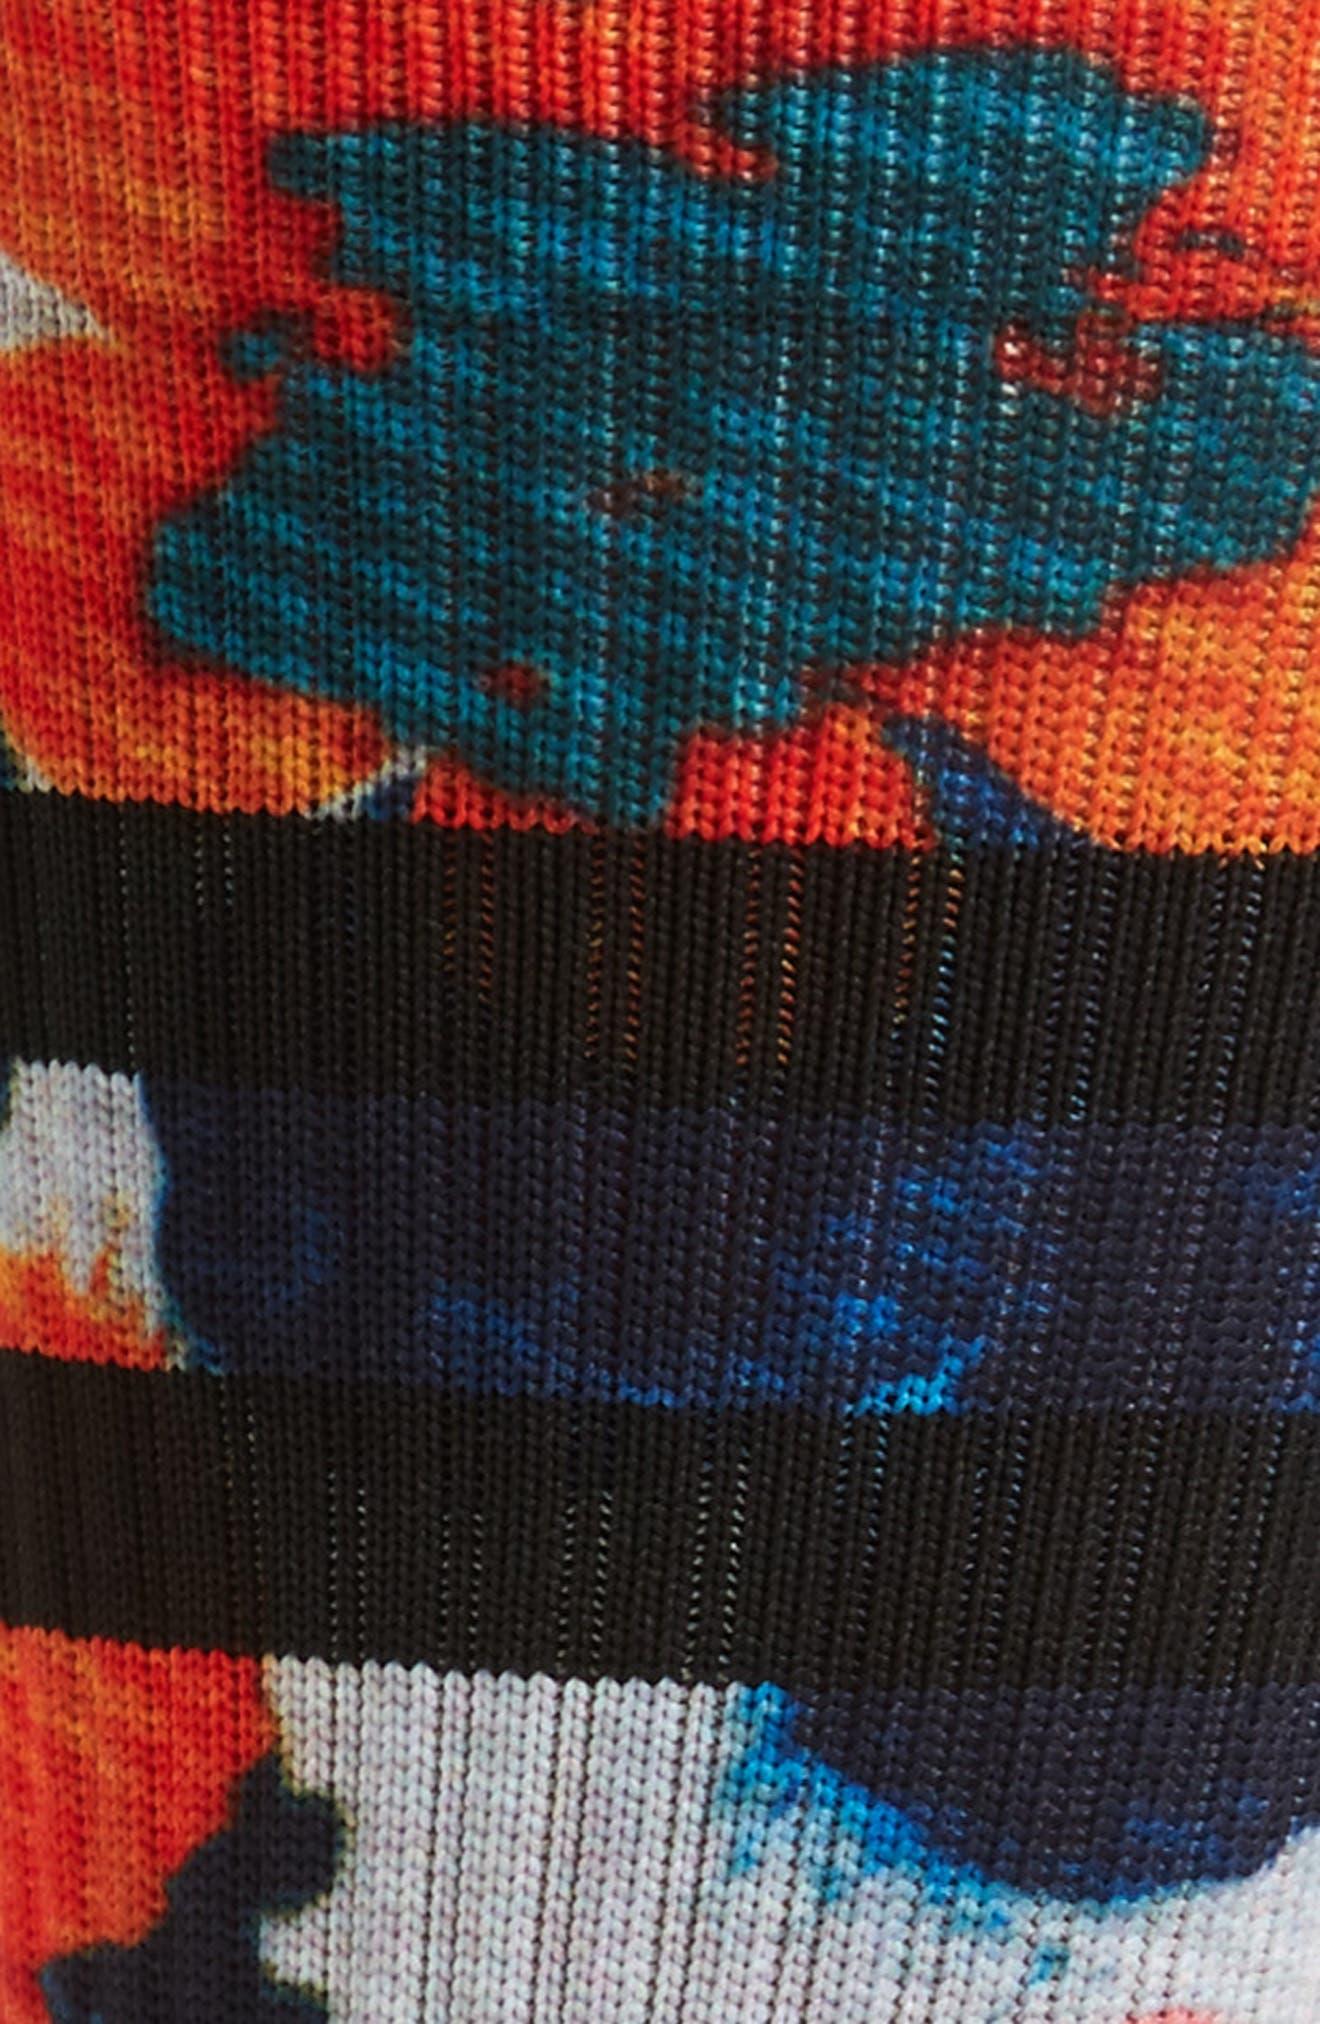 Frangipani Floral Socks,                             Alternate thumbnail 2, color,                             Black/ Orange Multi